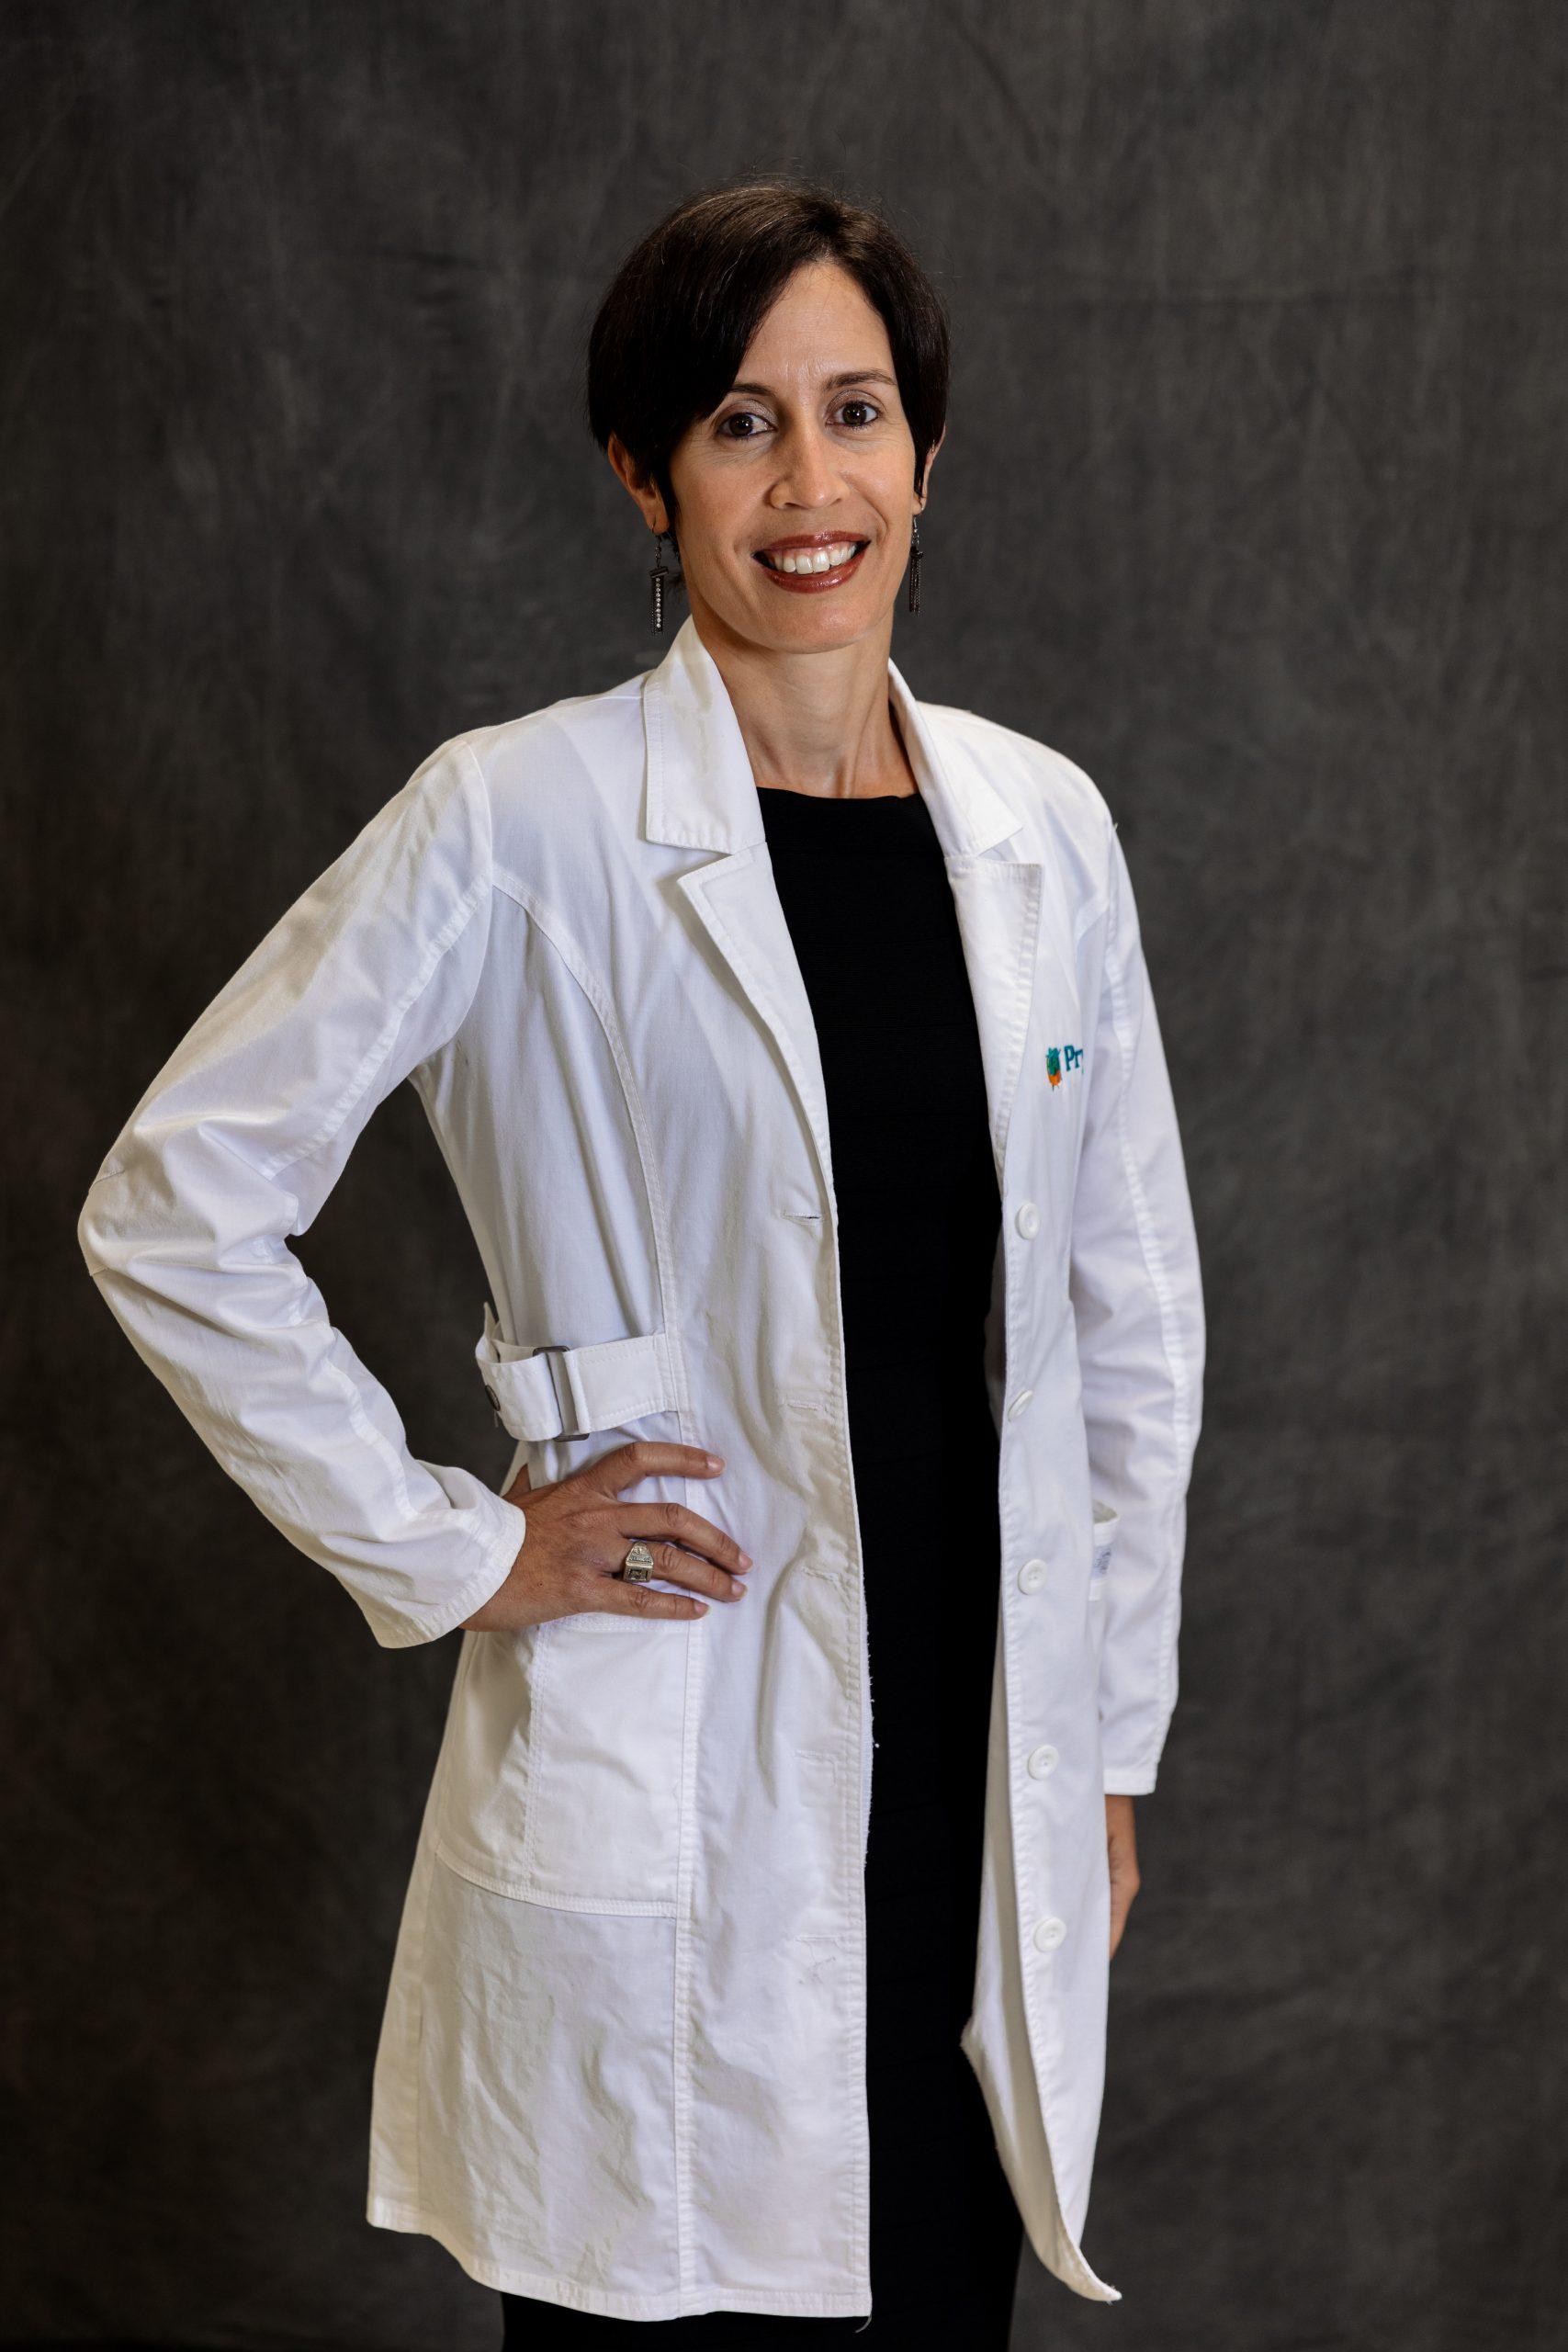 Dra. Vanessa Rios